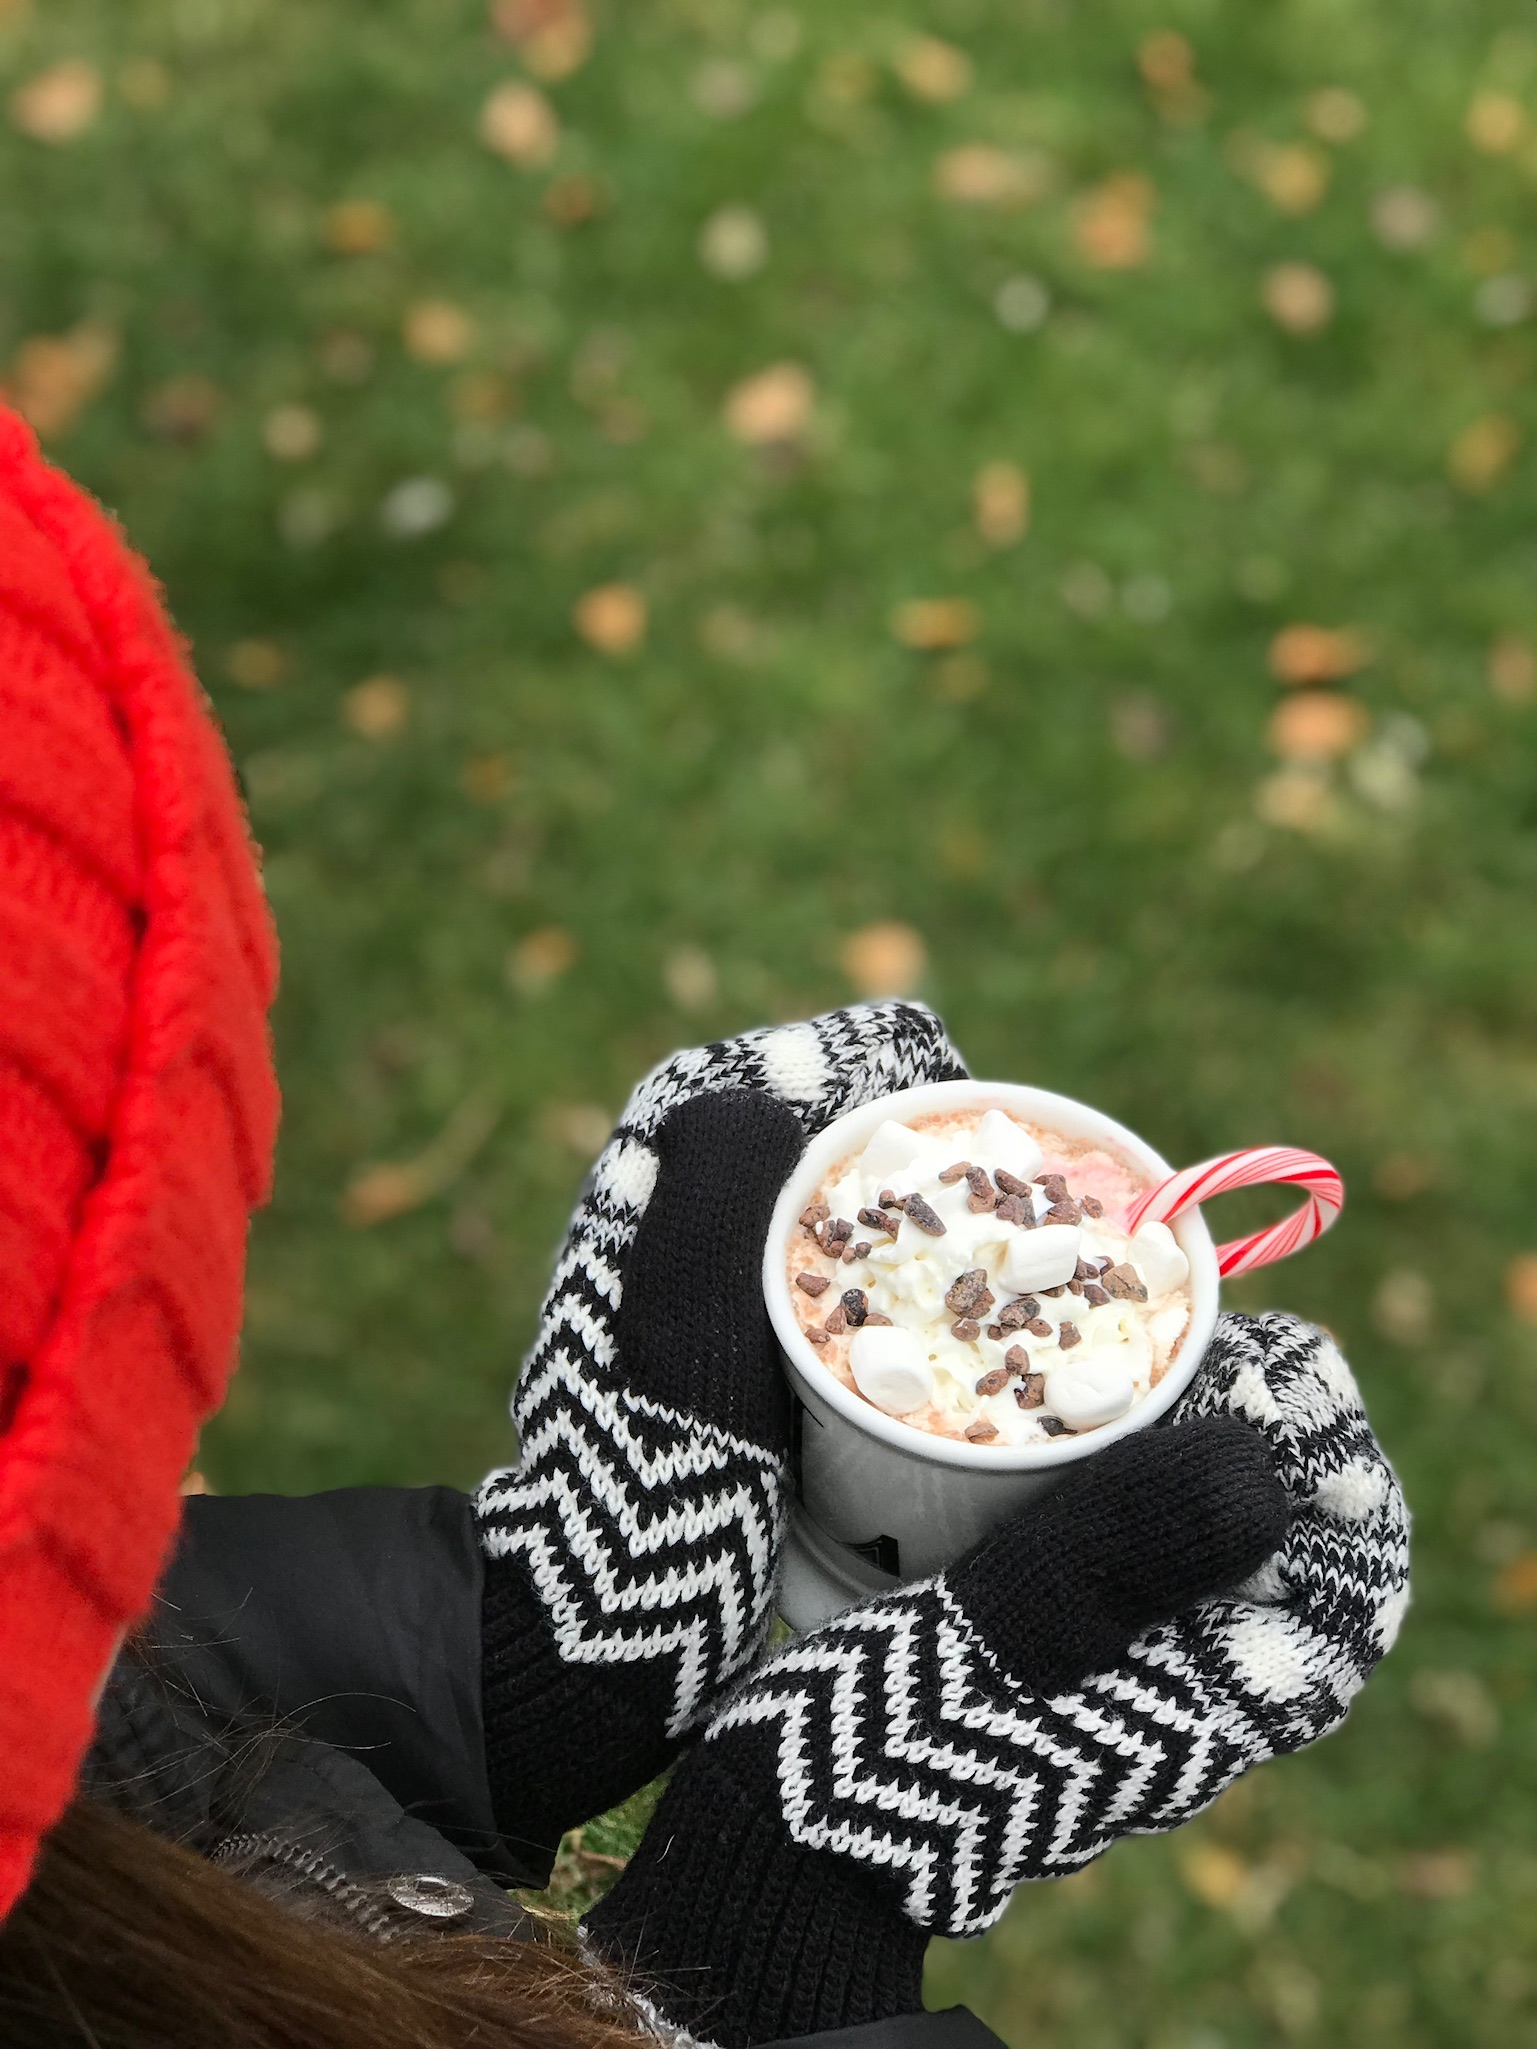 line & lee hot chocolate mix